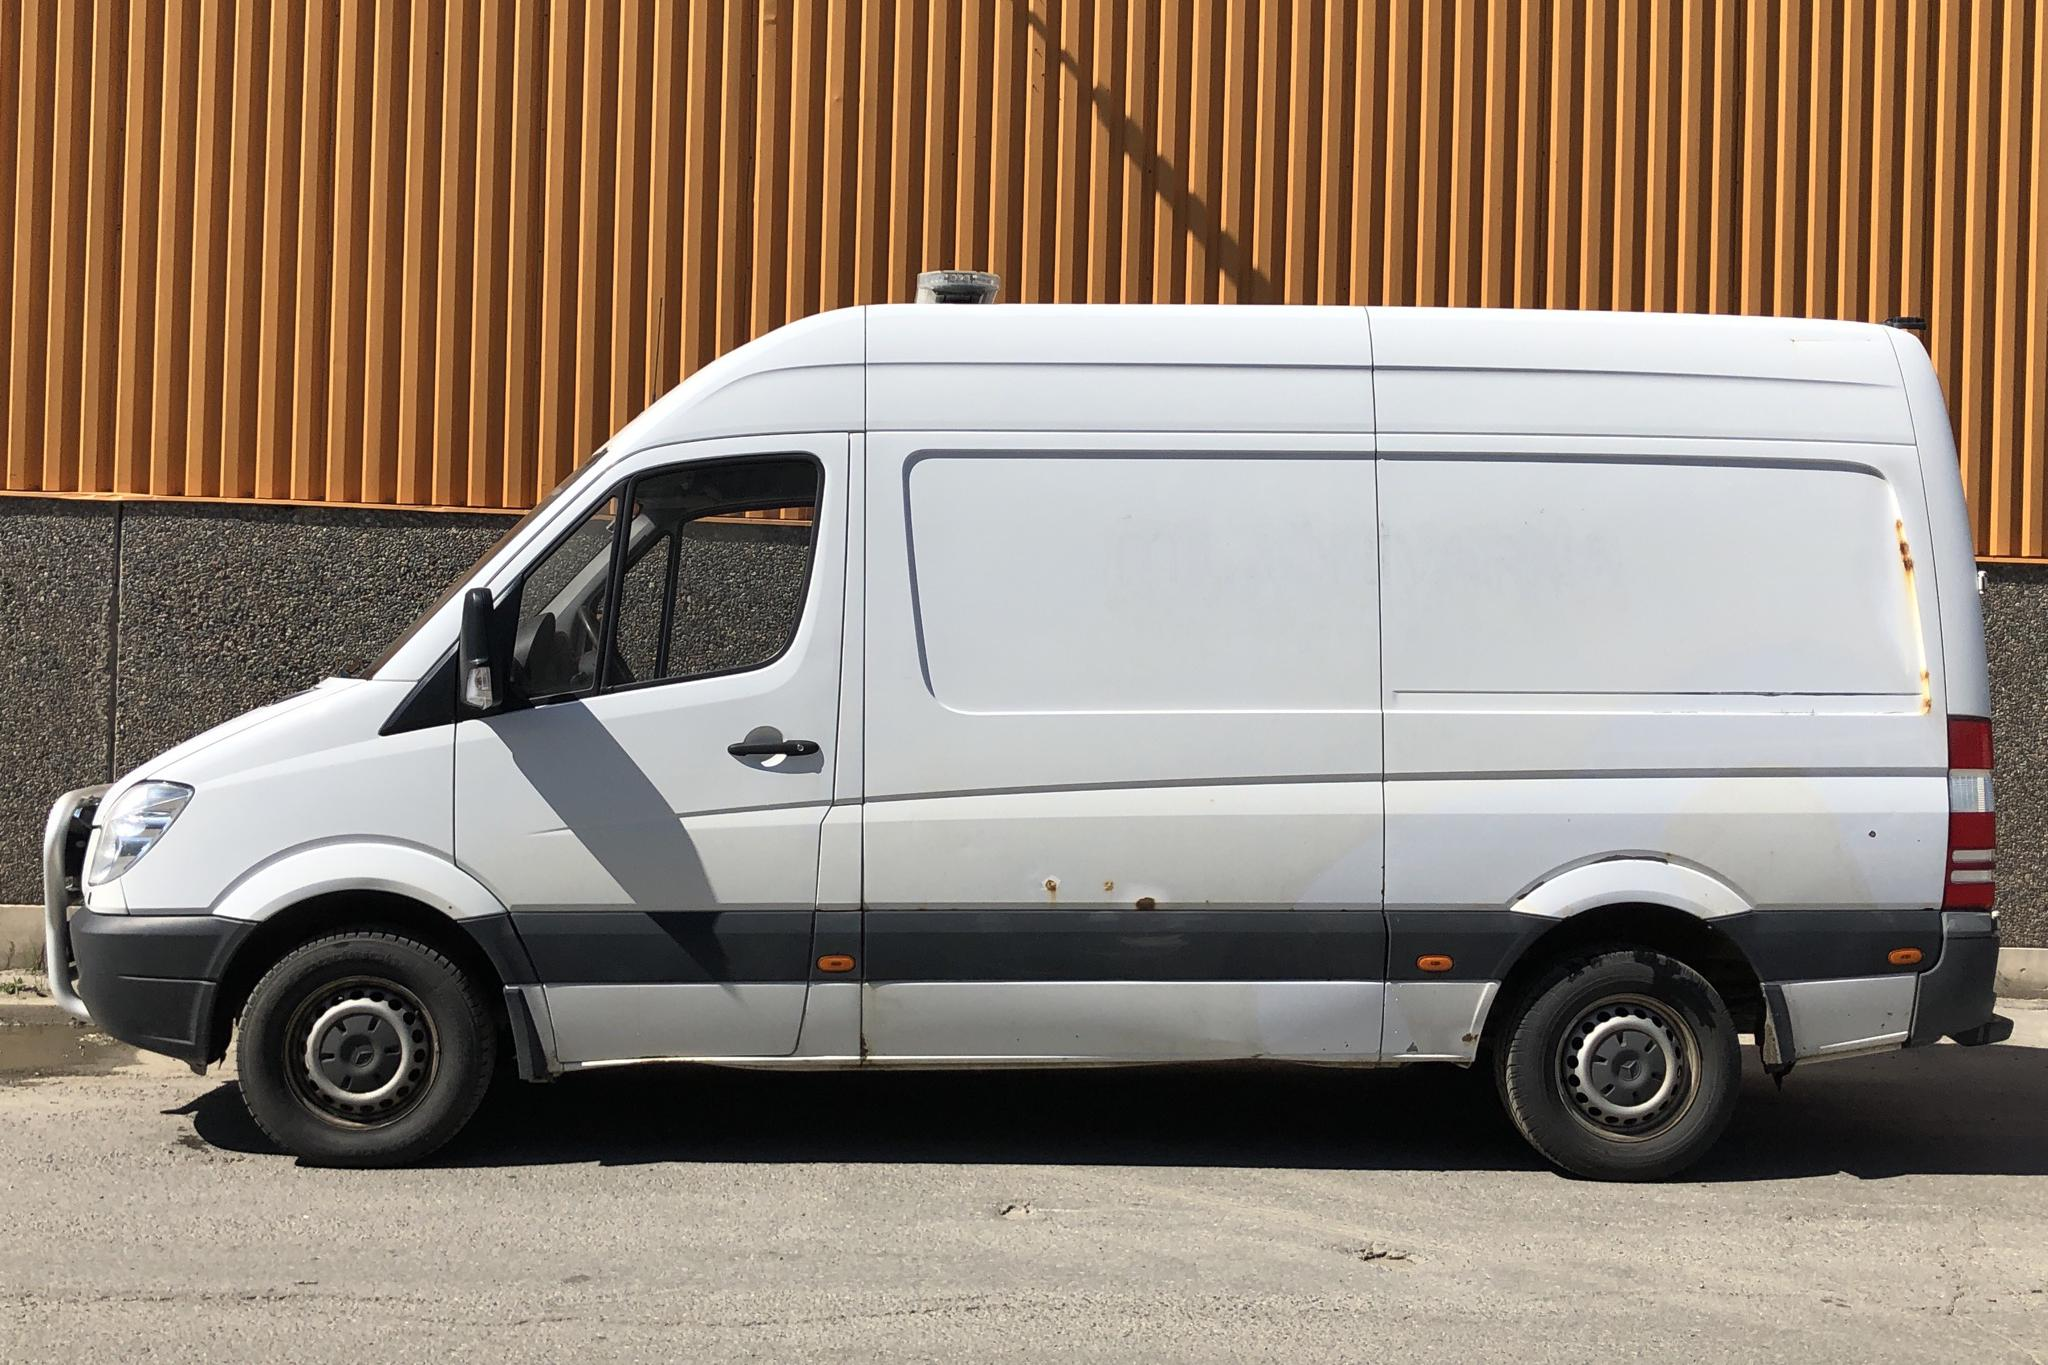 Mercedes Sprinter 313 CDI (129hk) - 15 699 mil - Manuell - vit - 2012